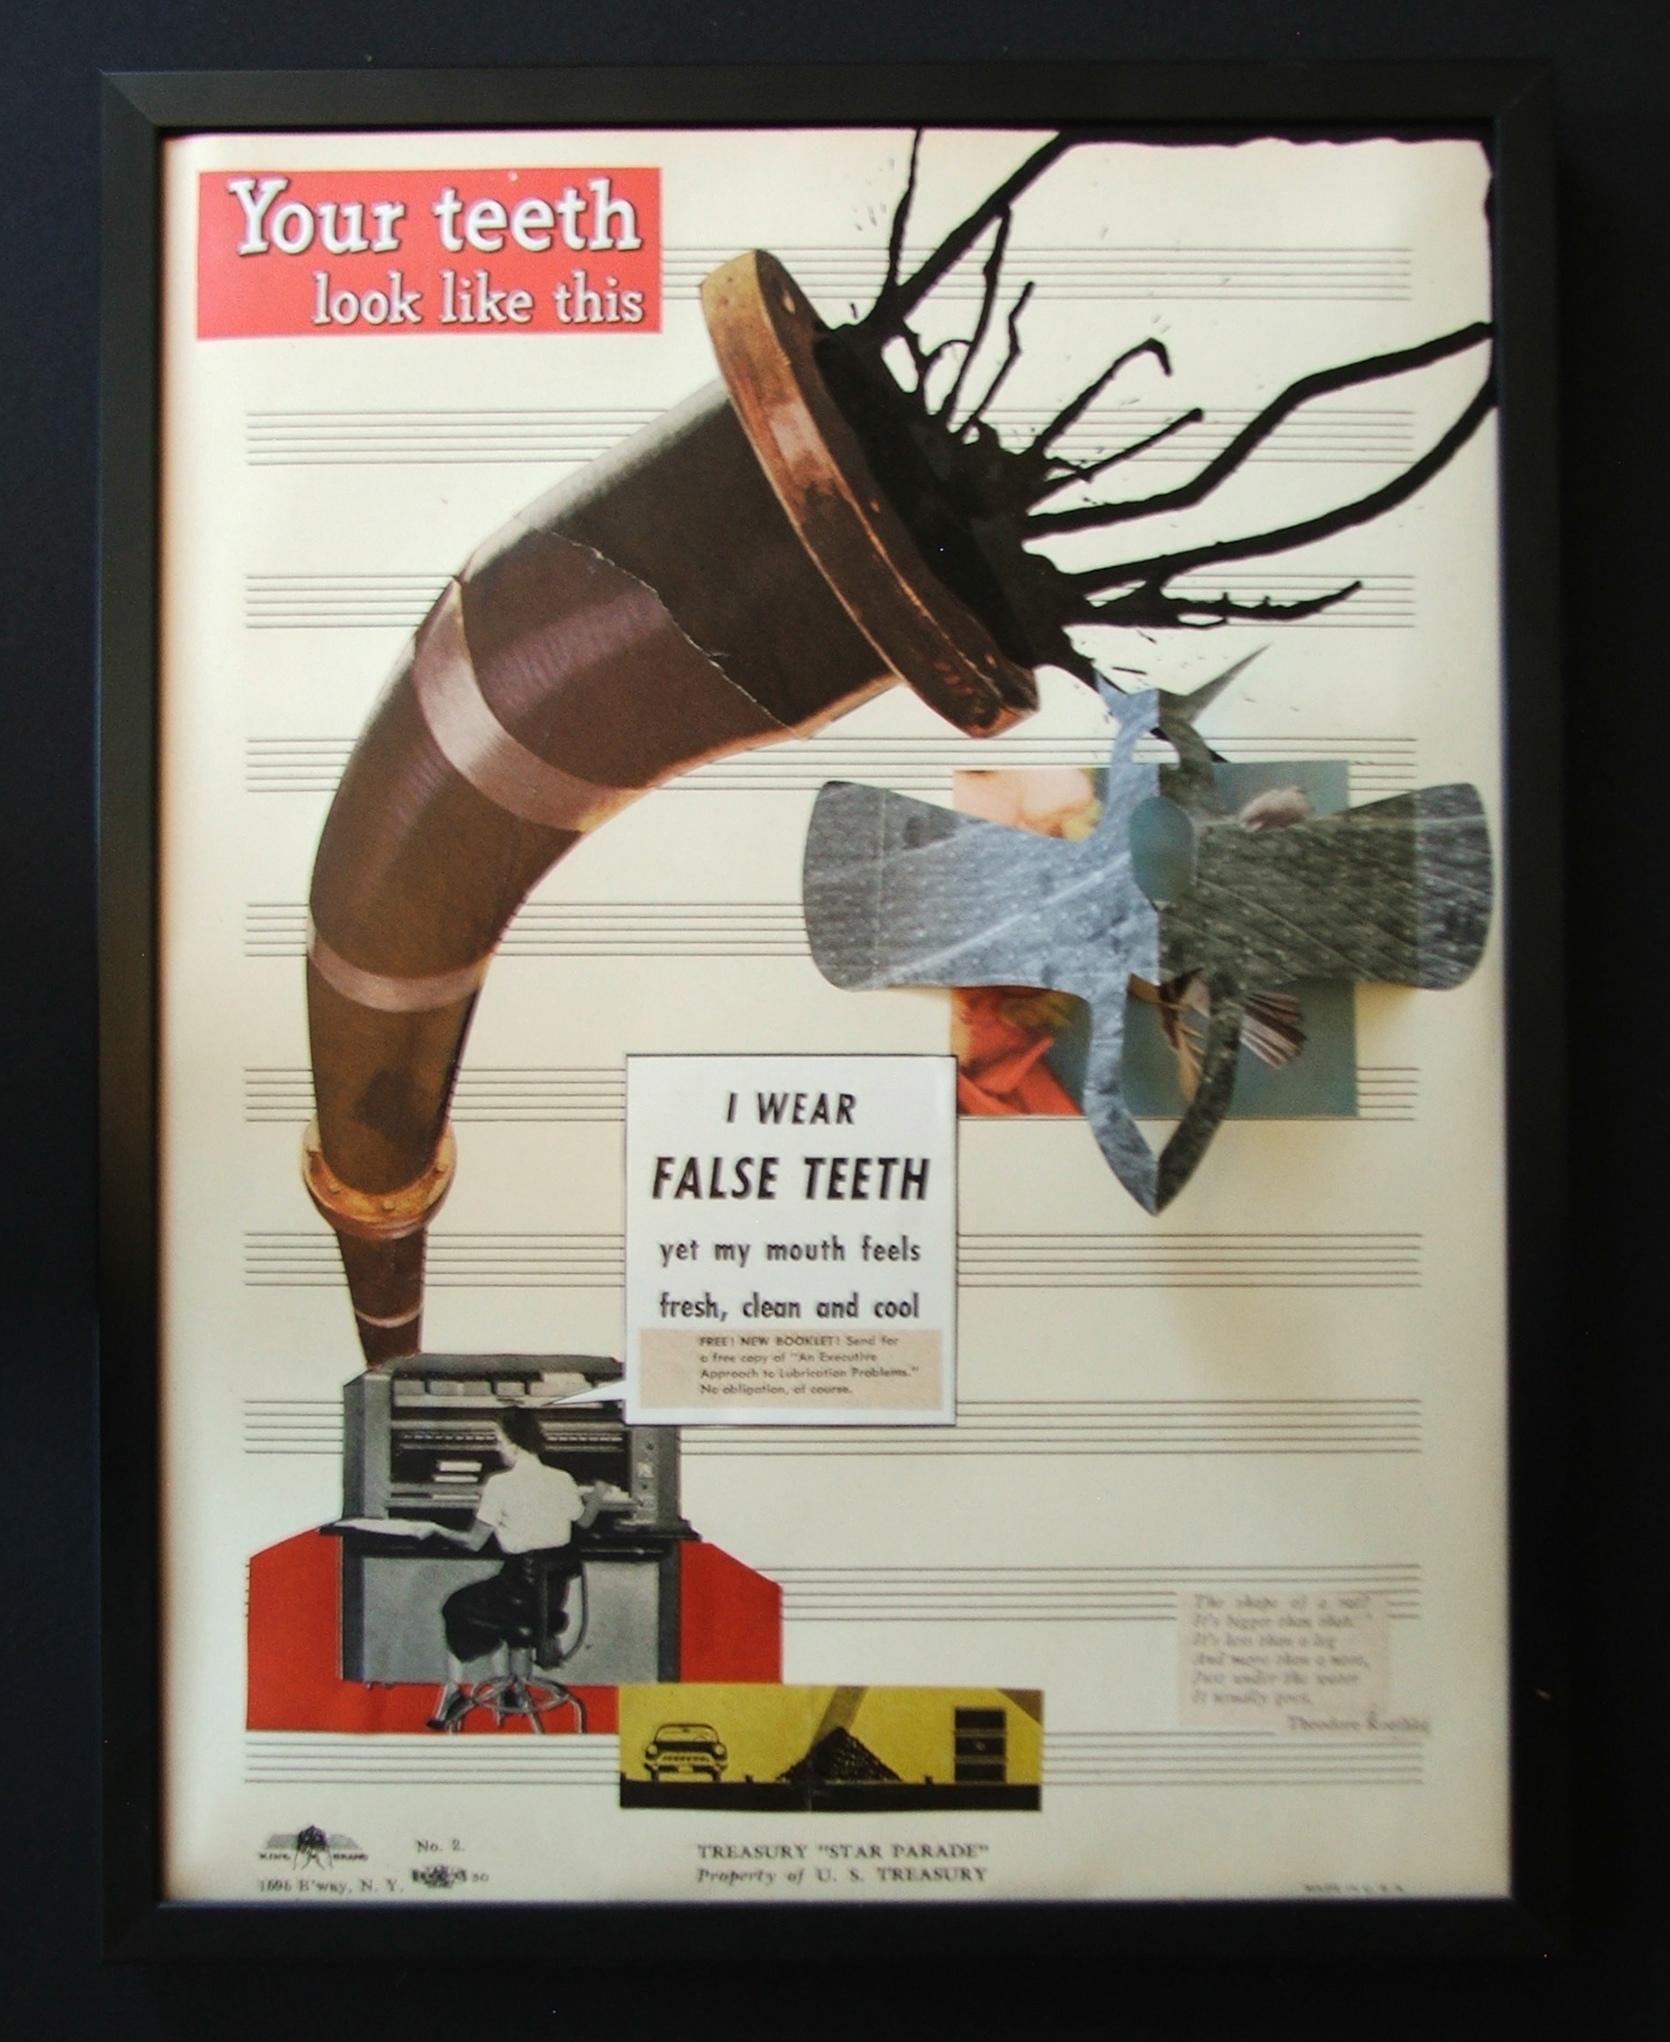 FALSE TEETH 345